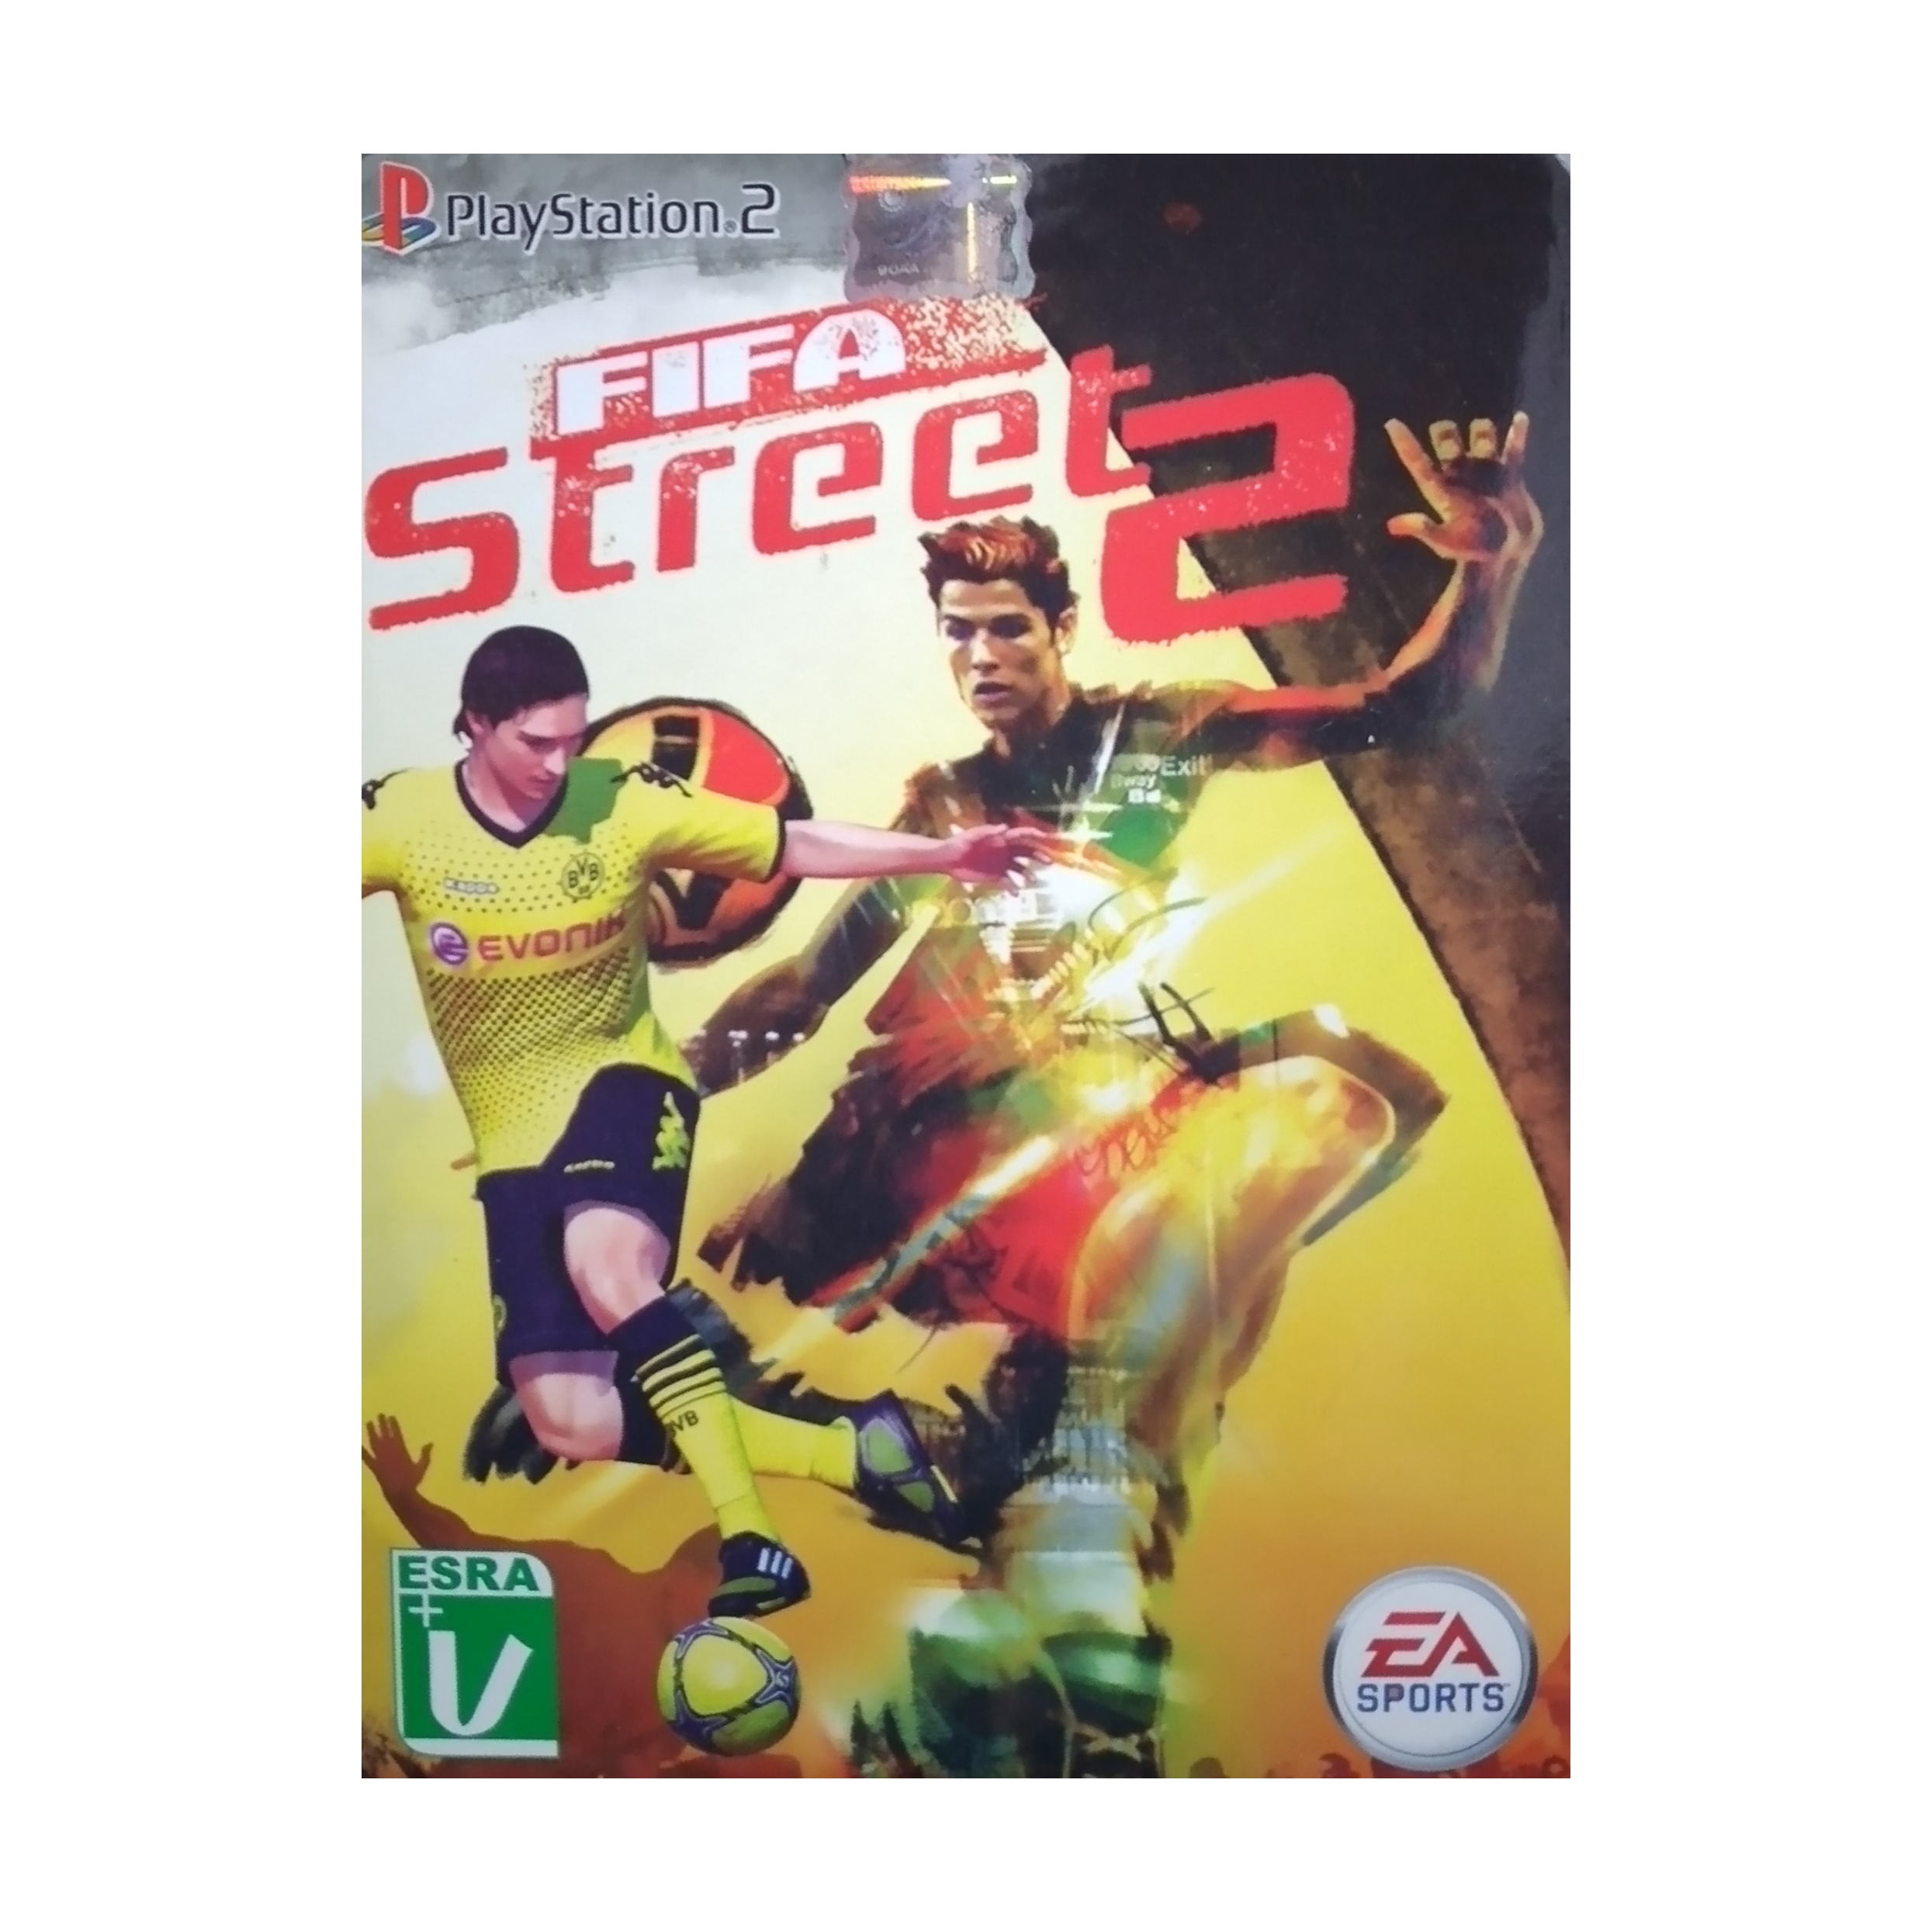 بازی FIFA STREET 2 مخصوص PS2 نشر لوح زرین